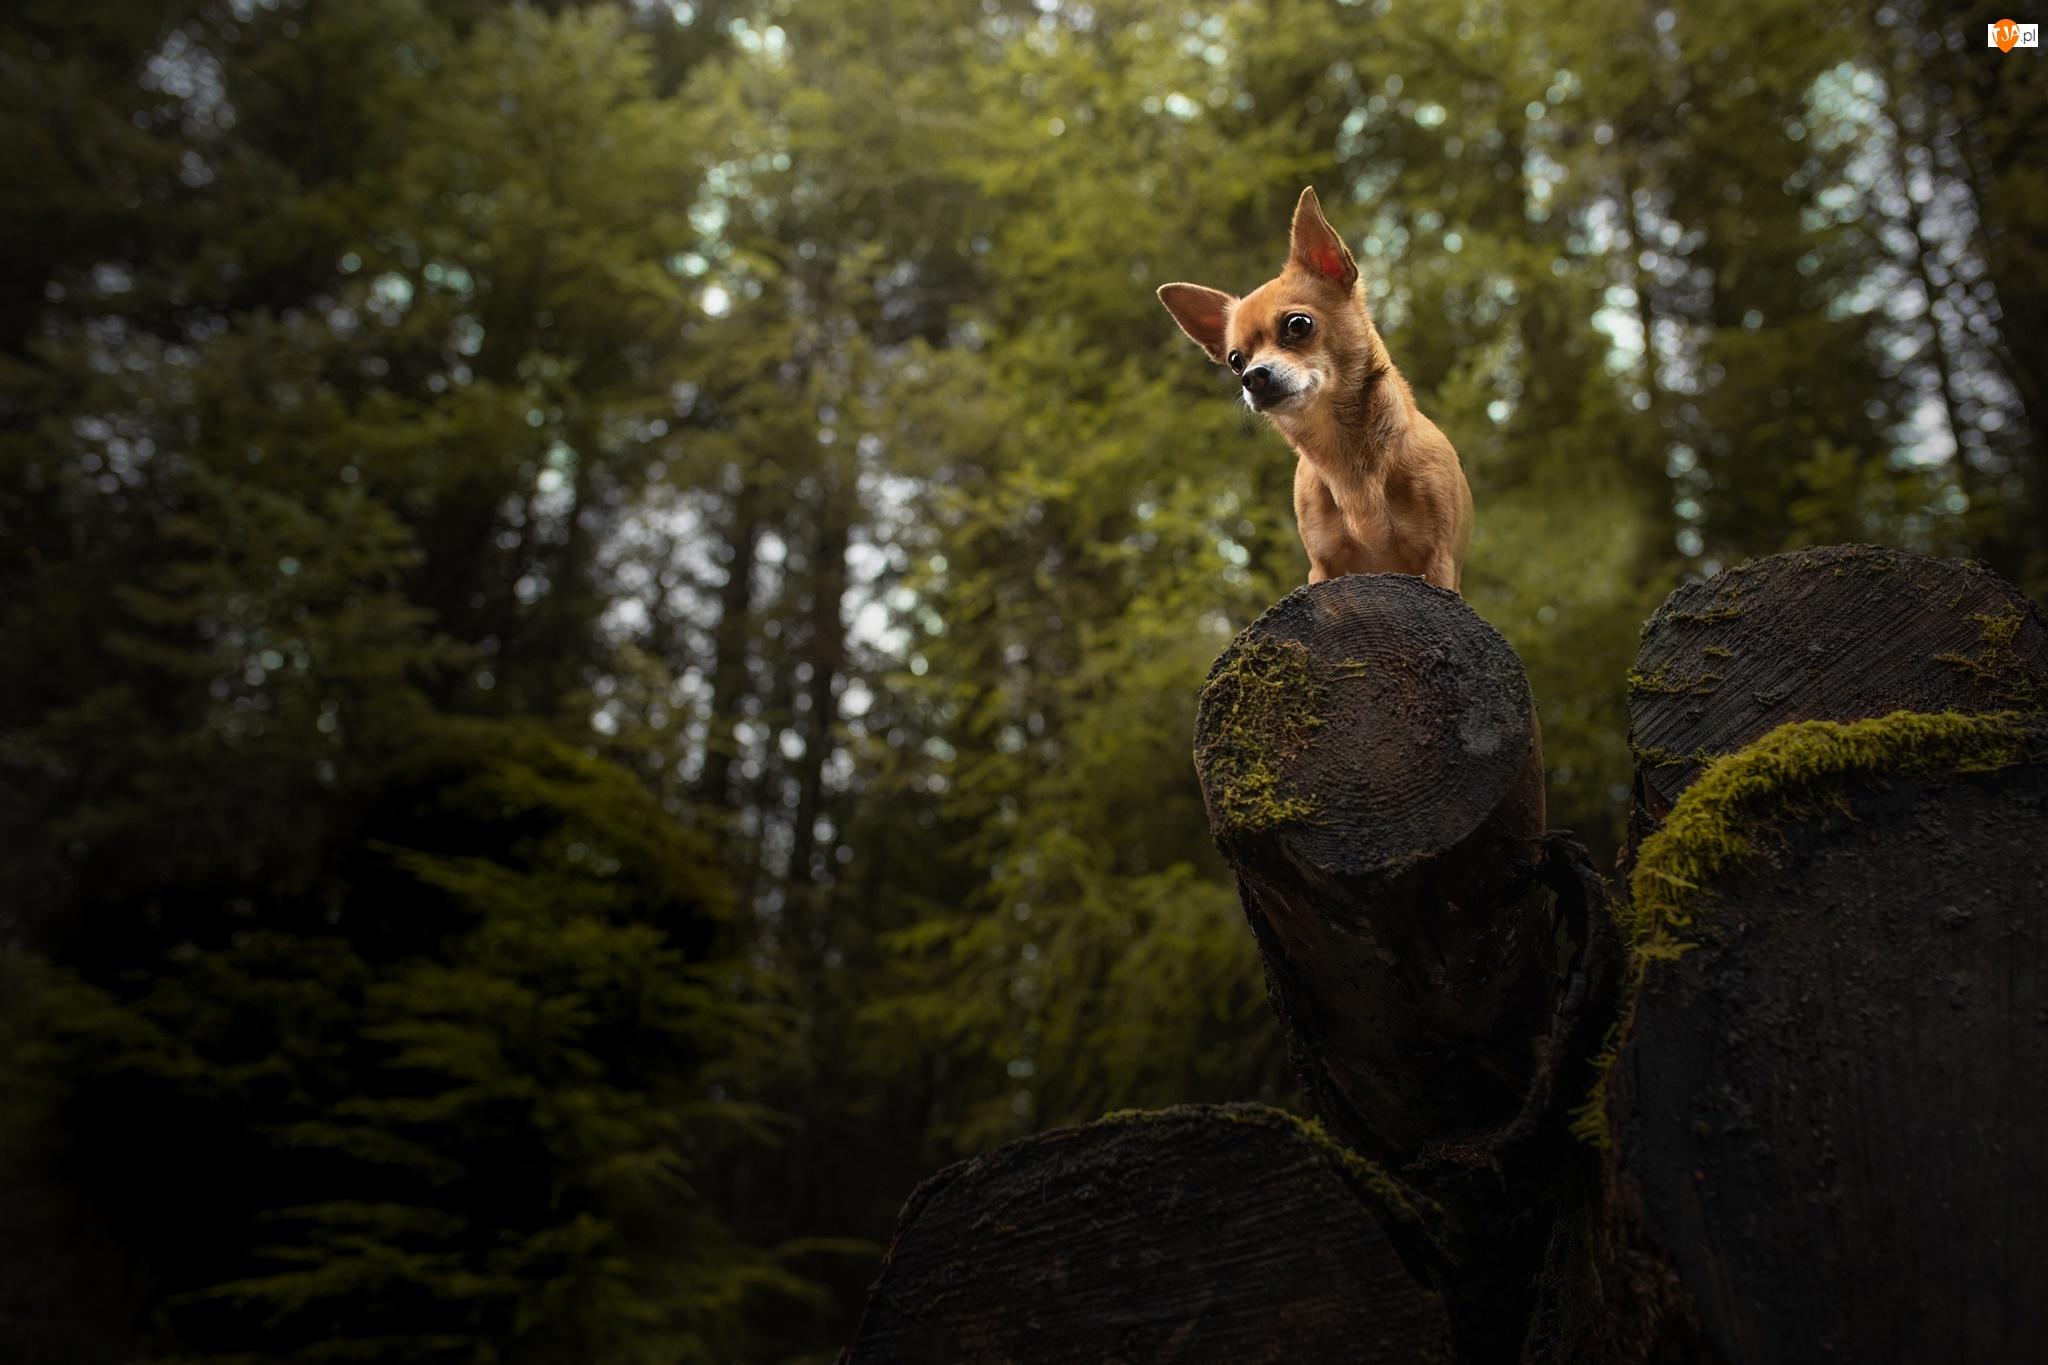 Las, Pies, Chihuahua krótkowłosa, Drewno